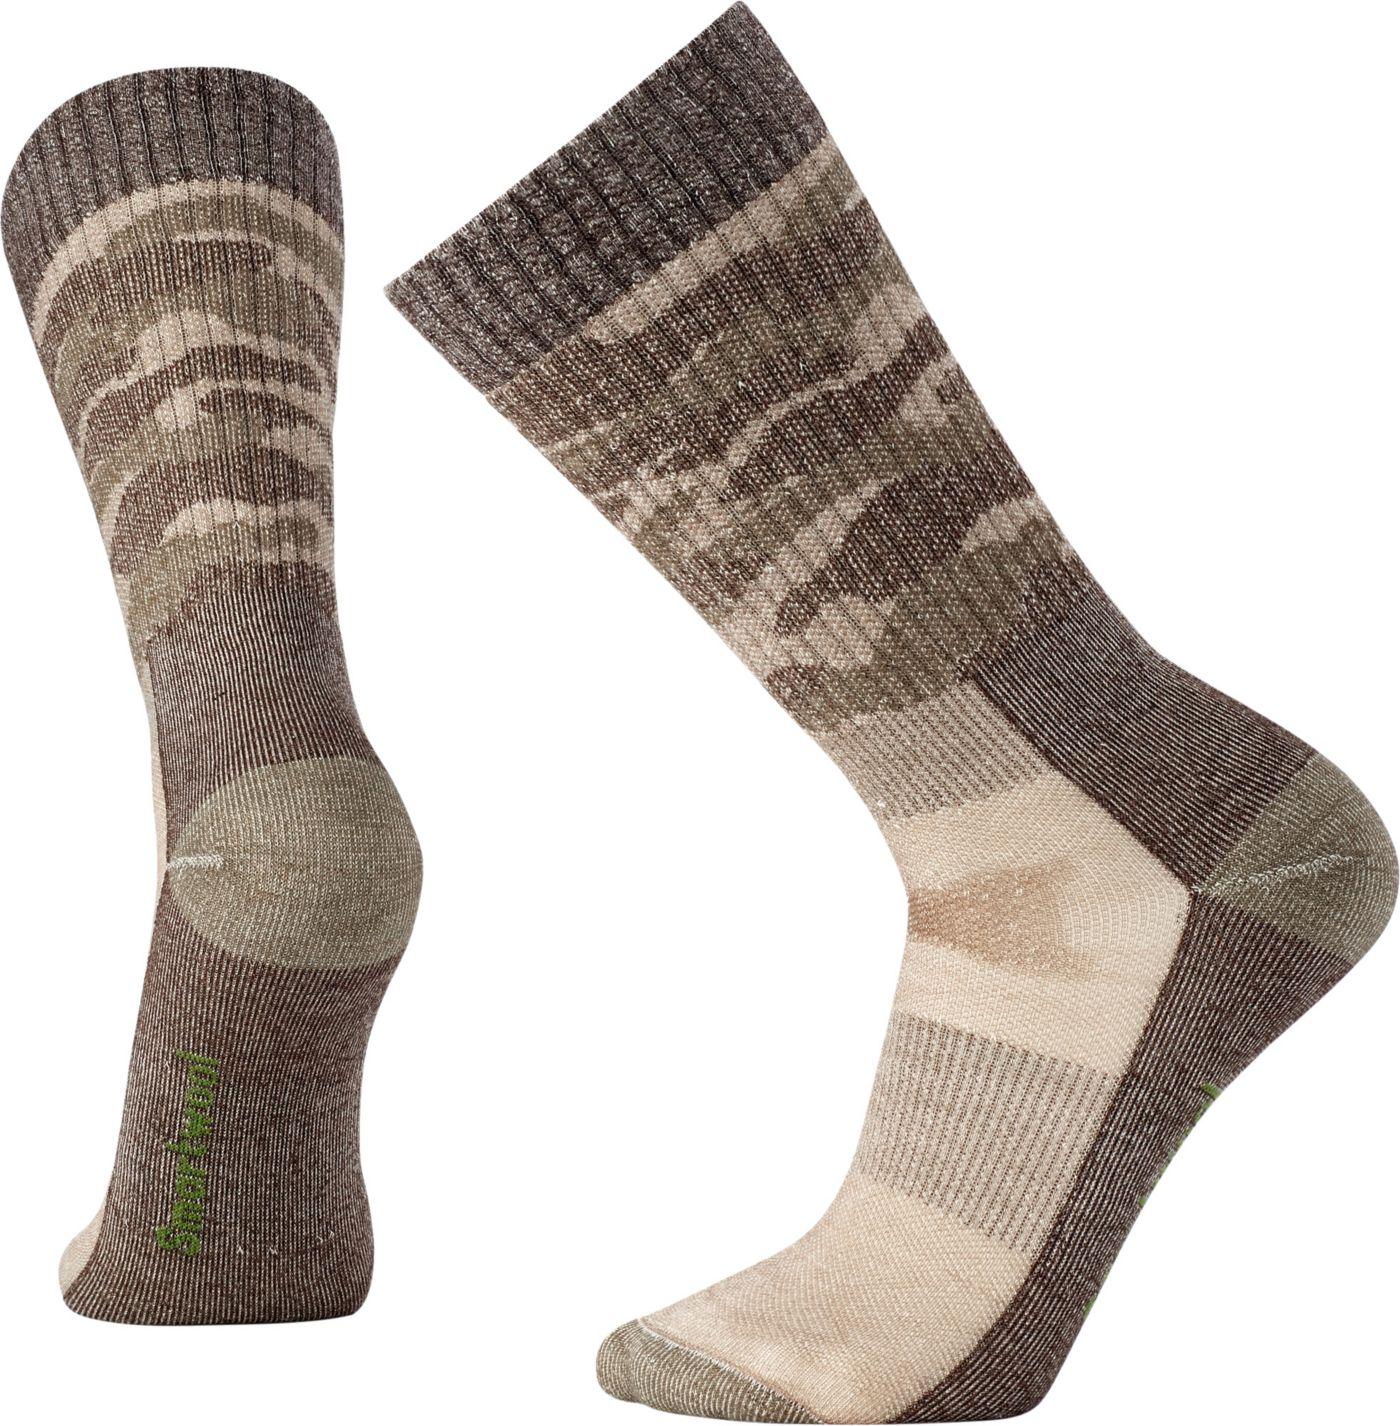 Smartwool Hunt Medium Camo Crew Socks